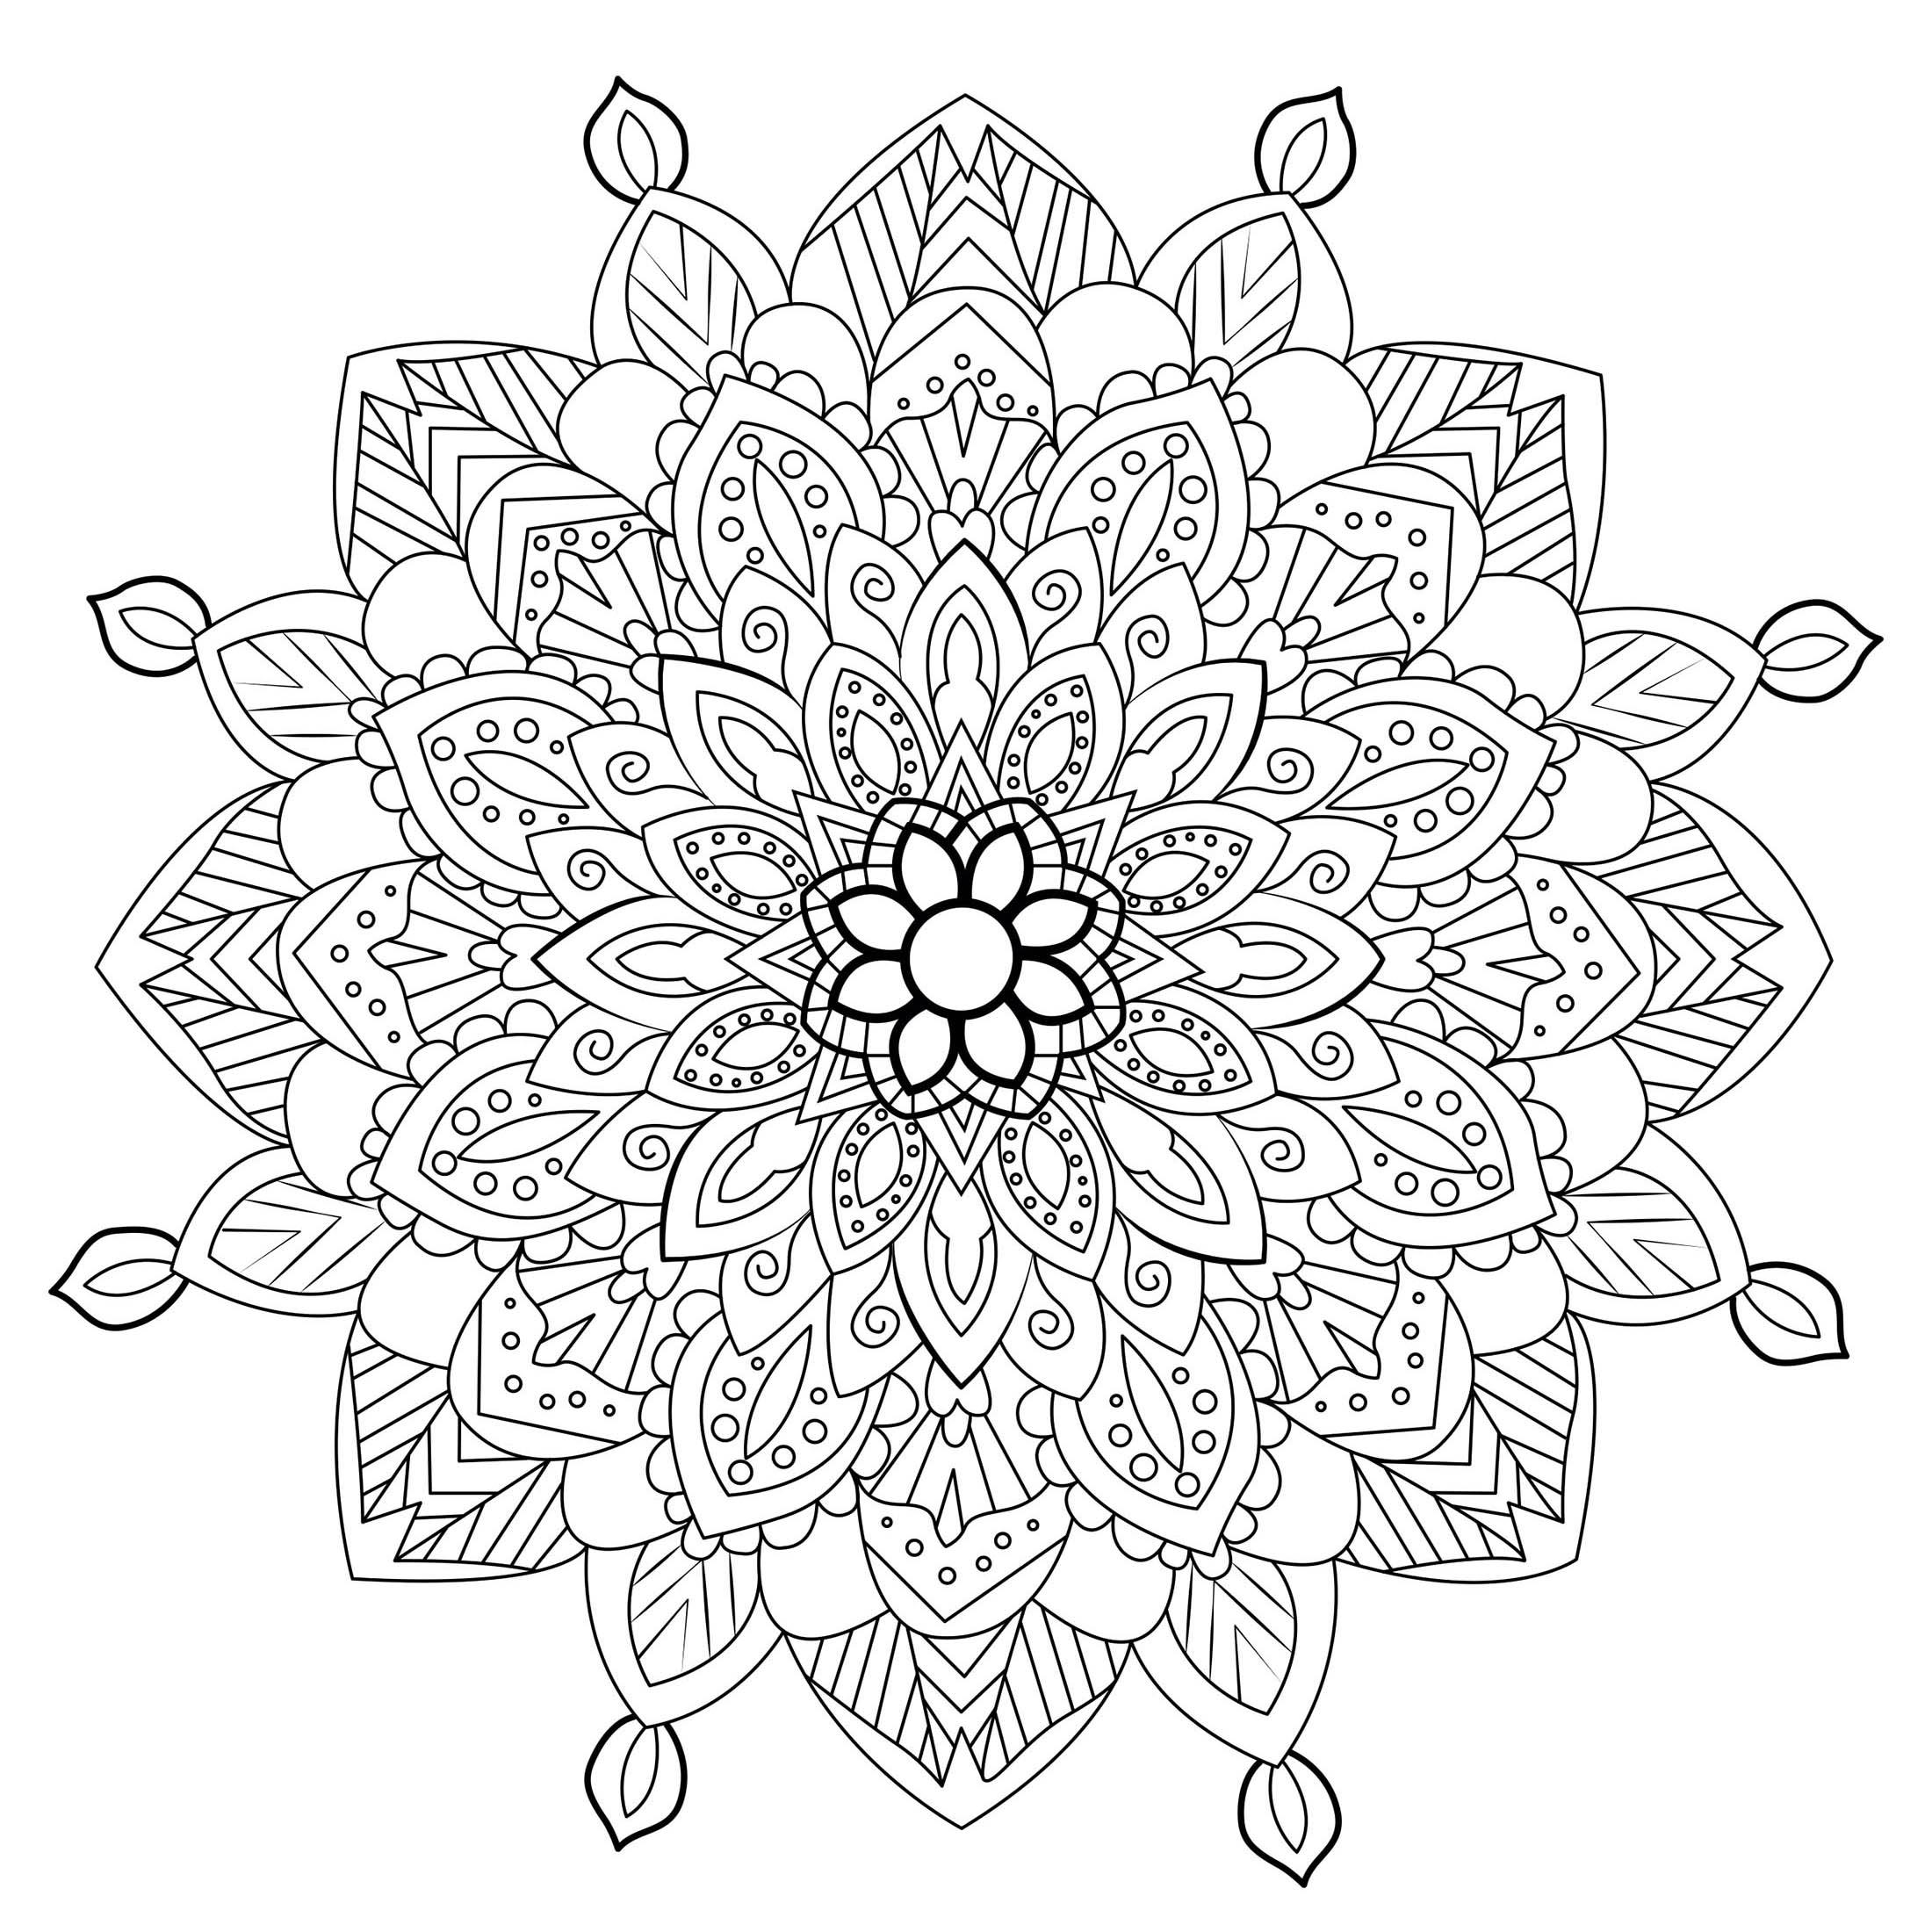 Zen & Anti stress Mandala 3 - M&alas Adult Coloring Pages